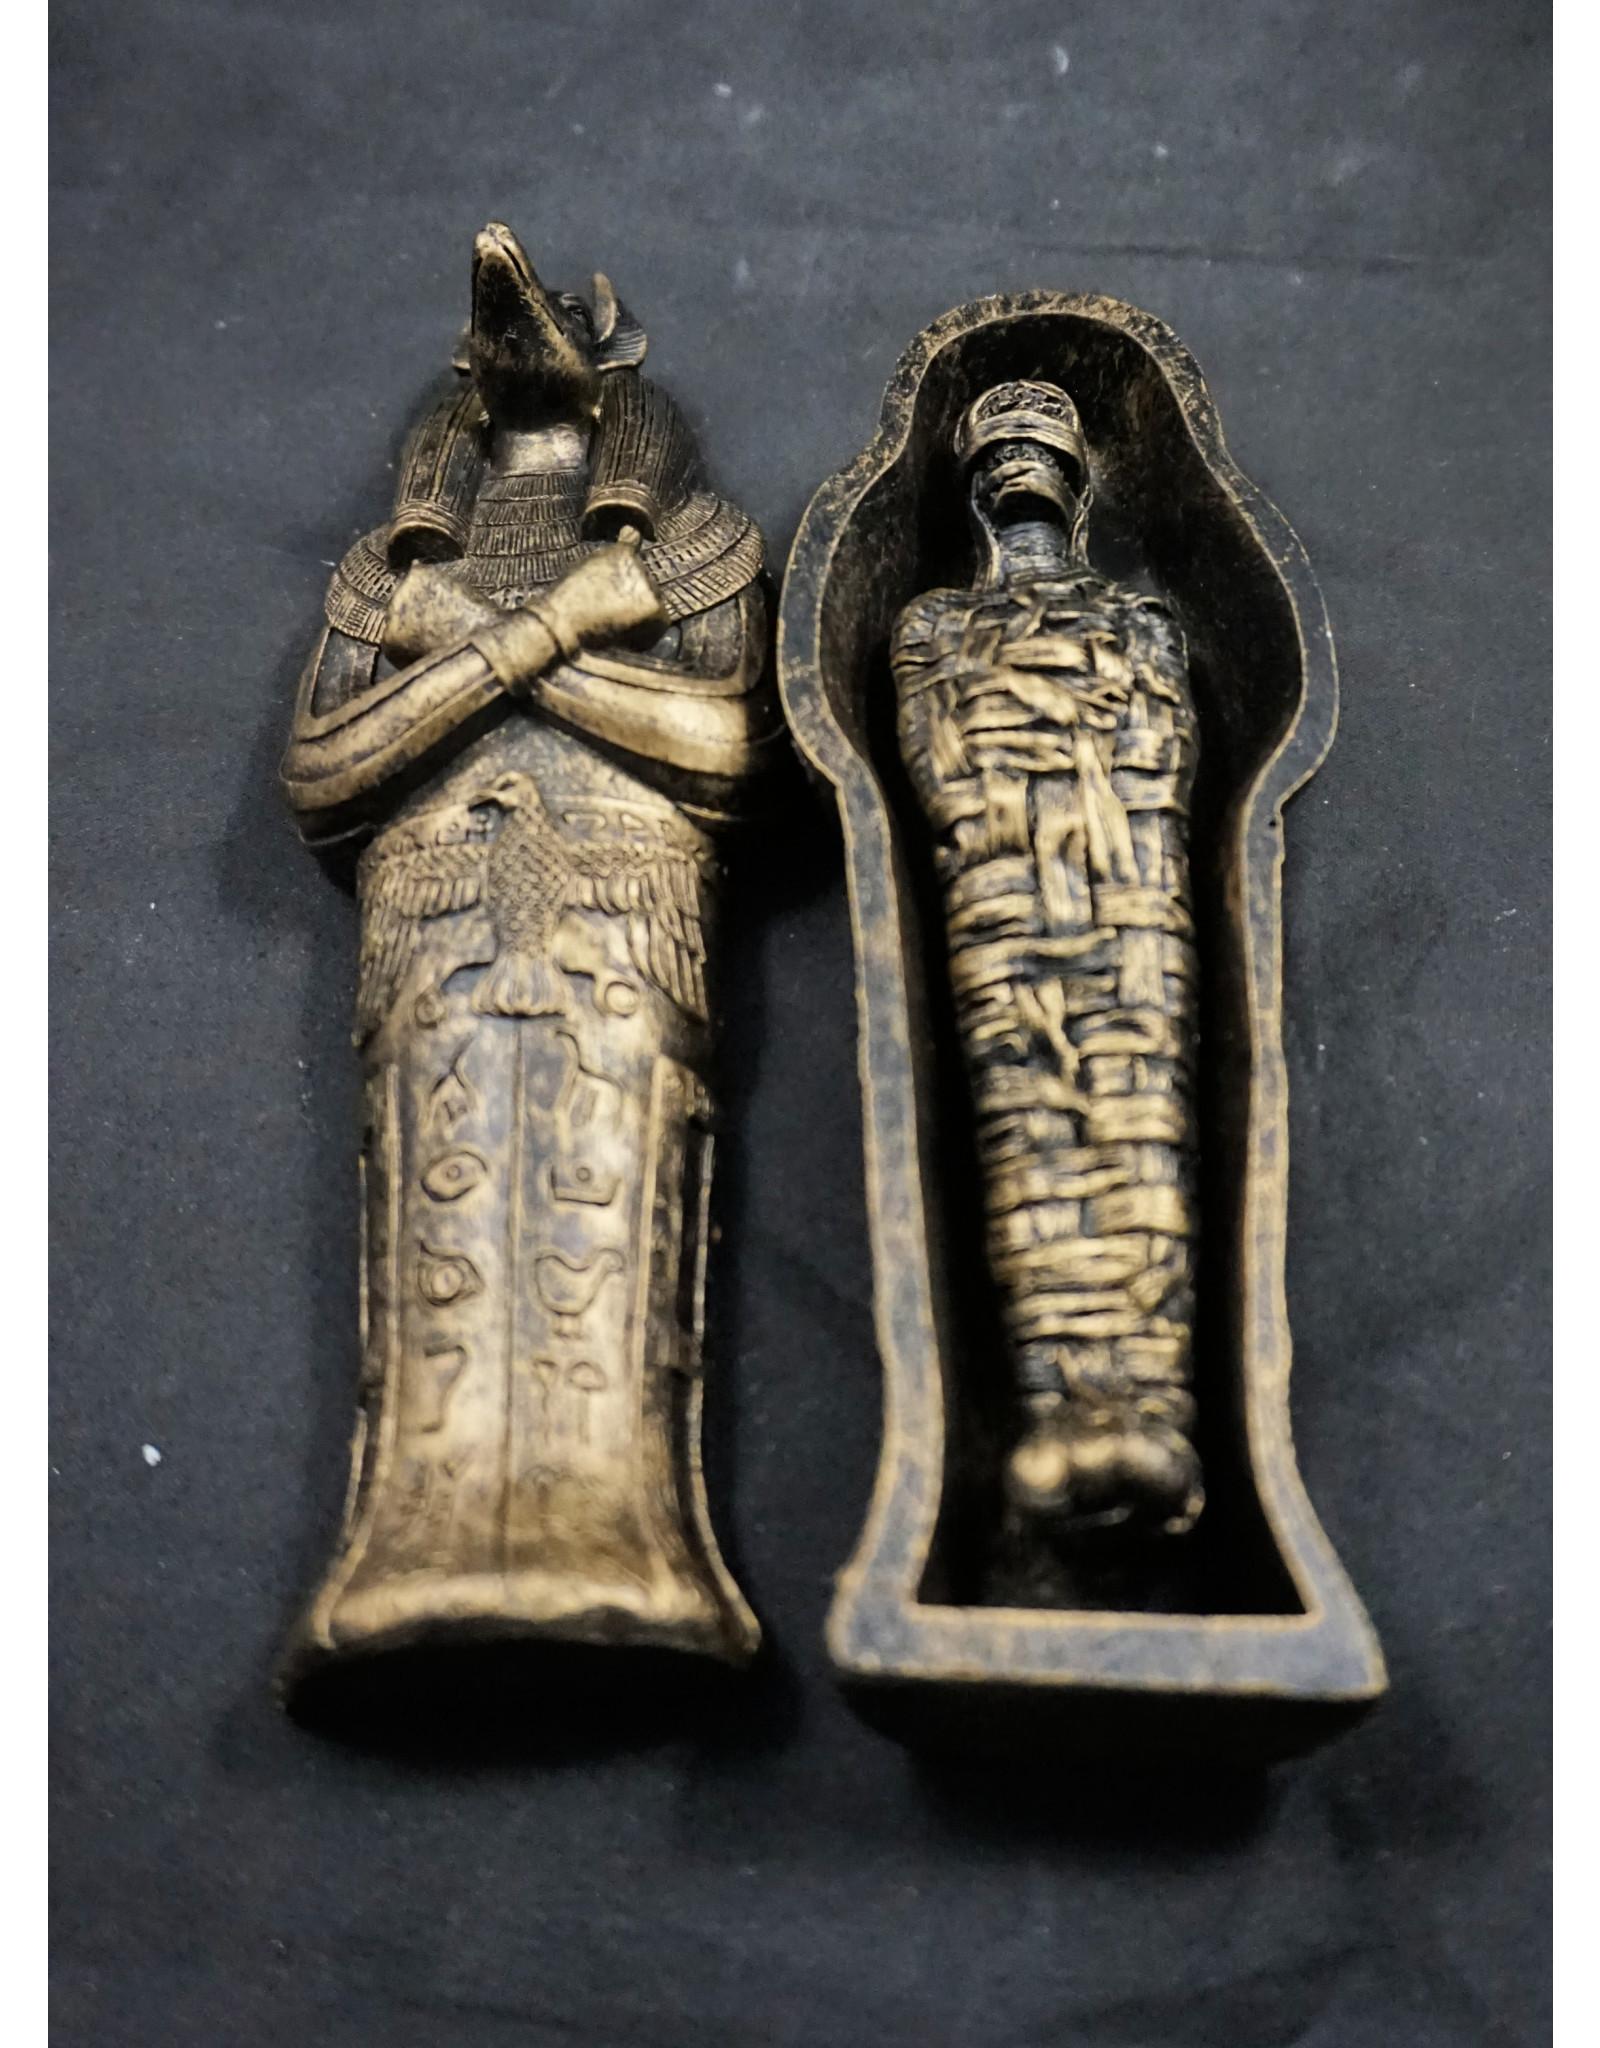 Egyptian Statue - Anubis Sarcophagus w/ Mummy